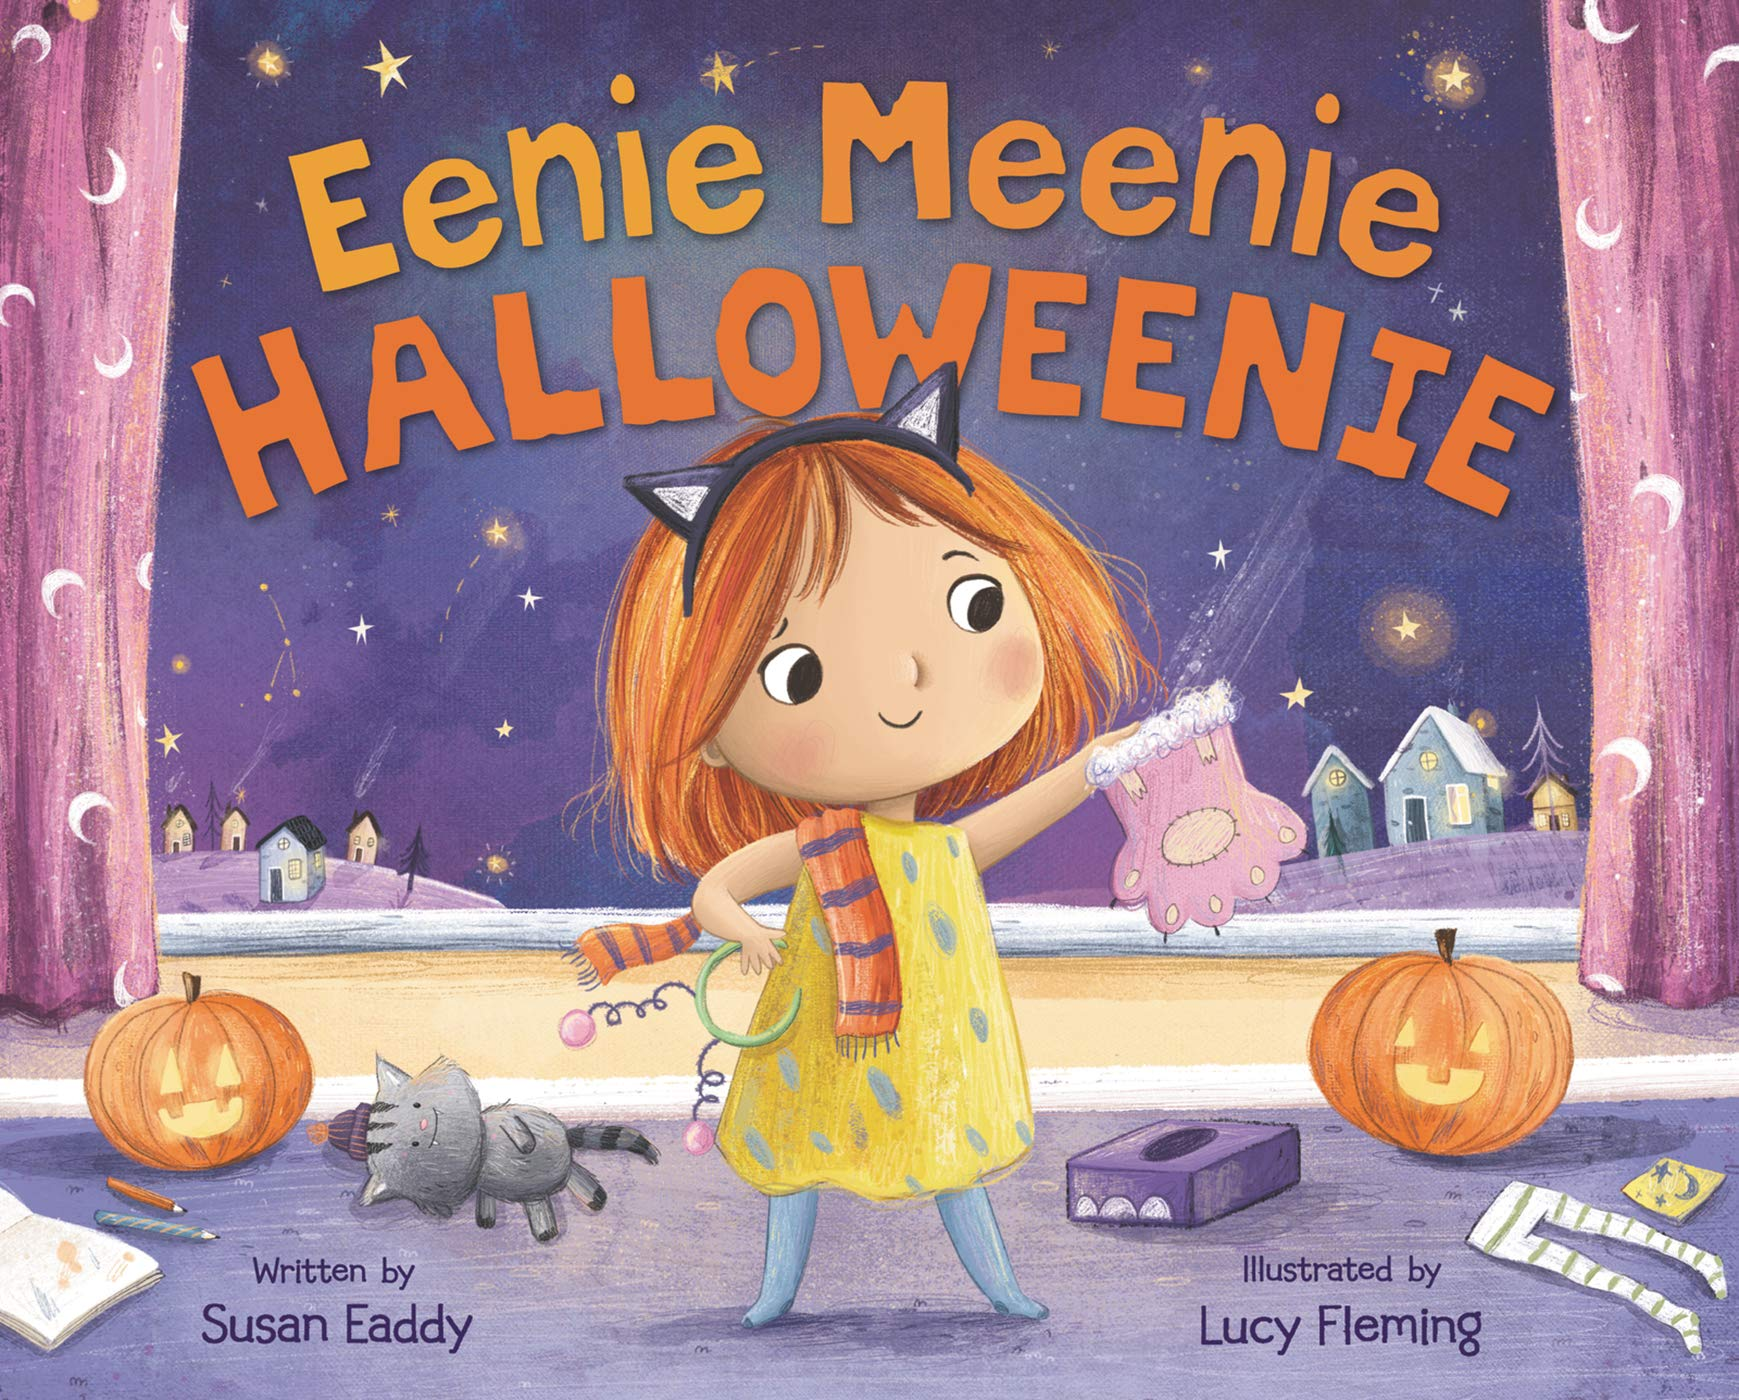 Eenie Meenie Halloweenie: Eaddy, Susan, Fleming, Lucy: 9780062691675: Amazon.com: Books